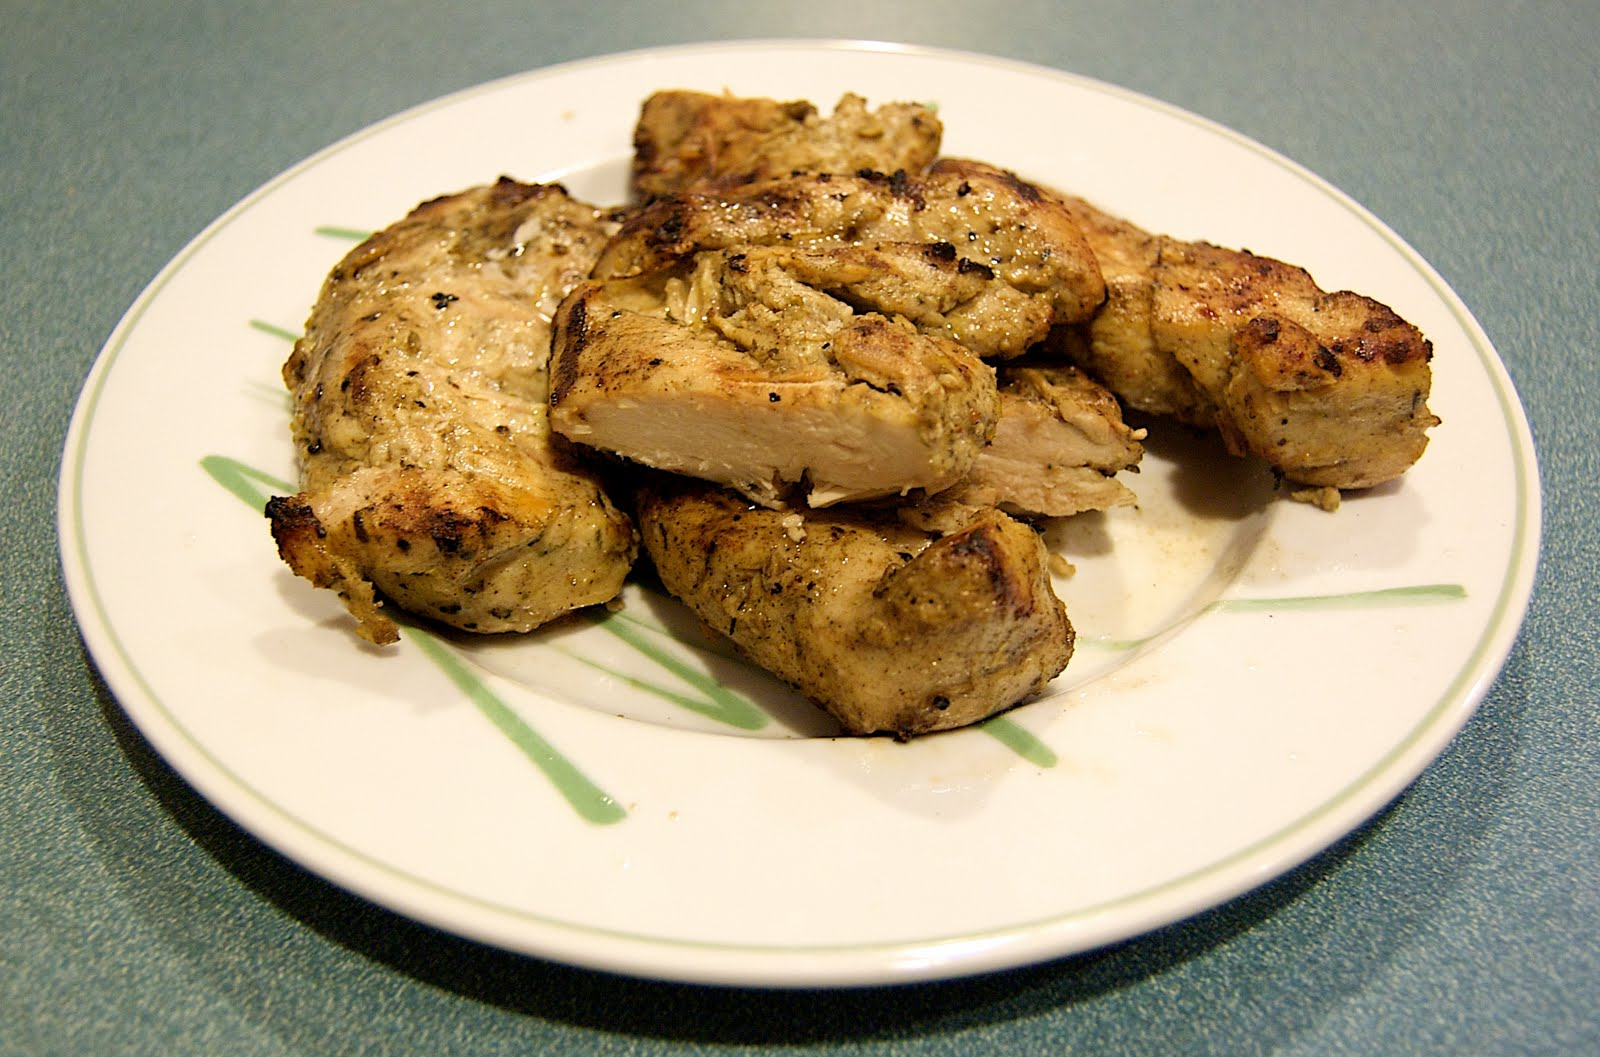 ... Cook: Grilled Chicken Breasts with Lemon Zest, Garlic & Herb Marinade